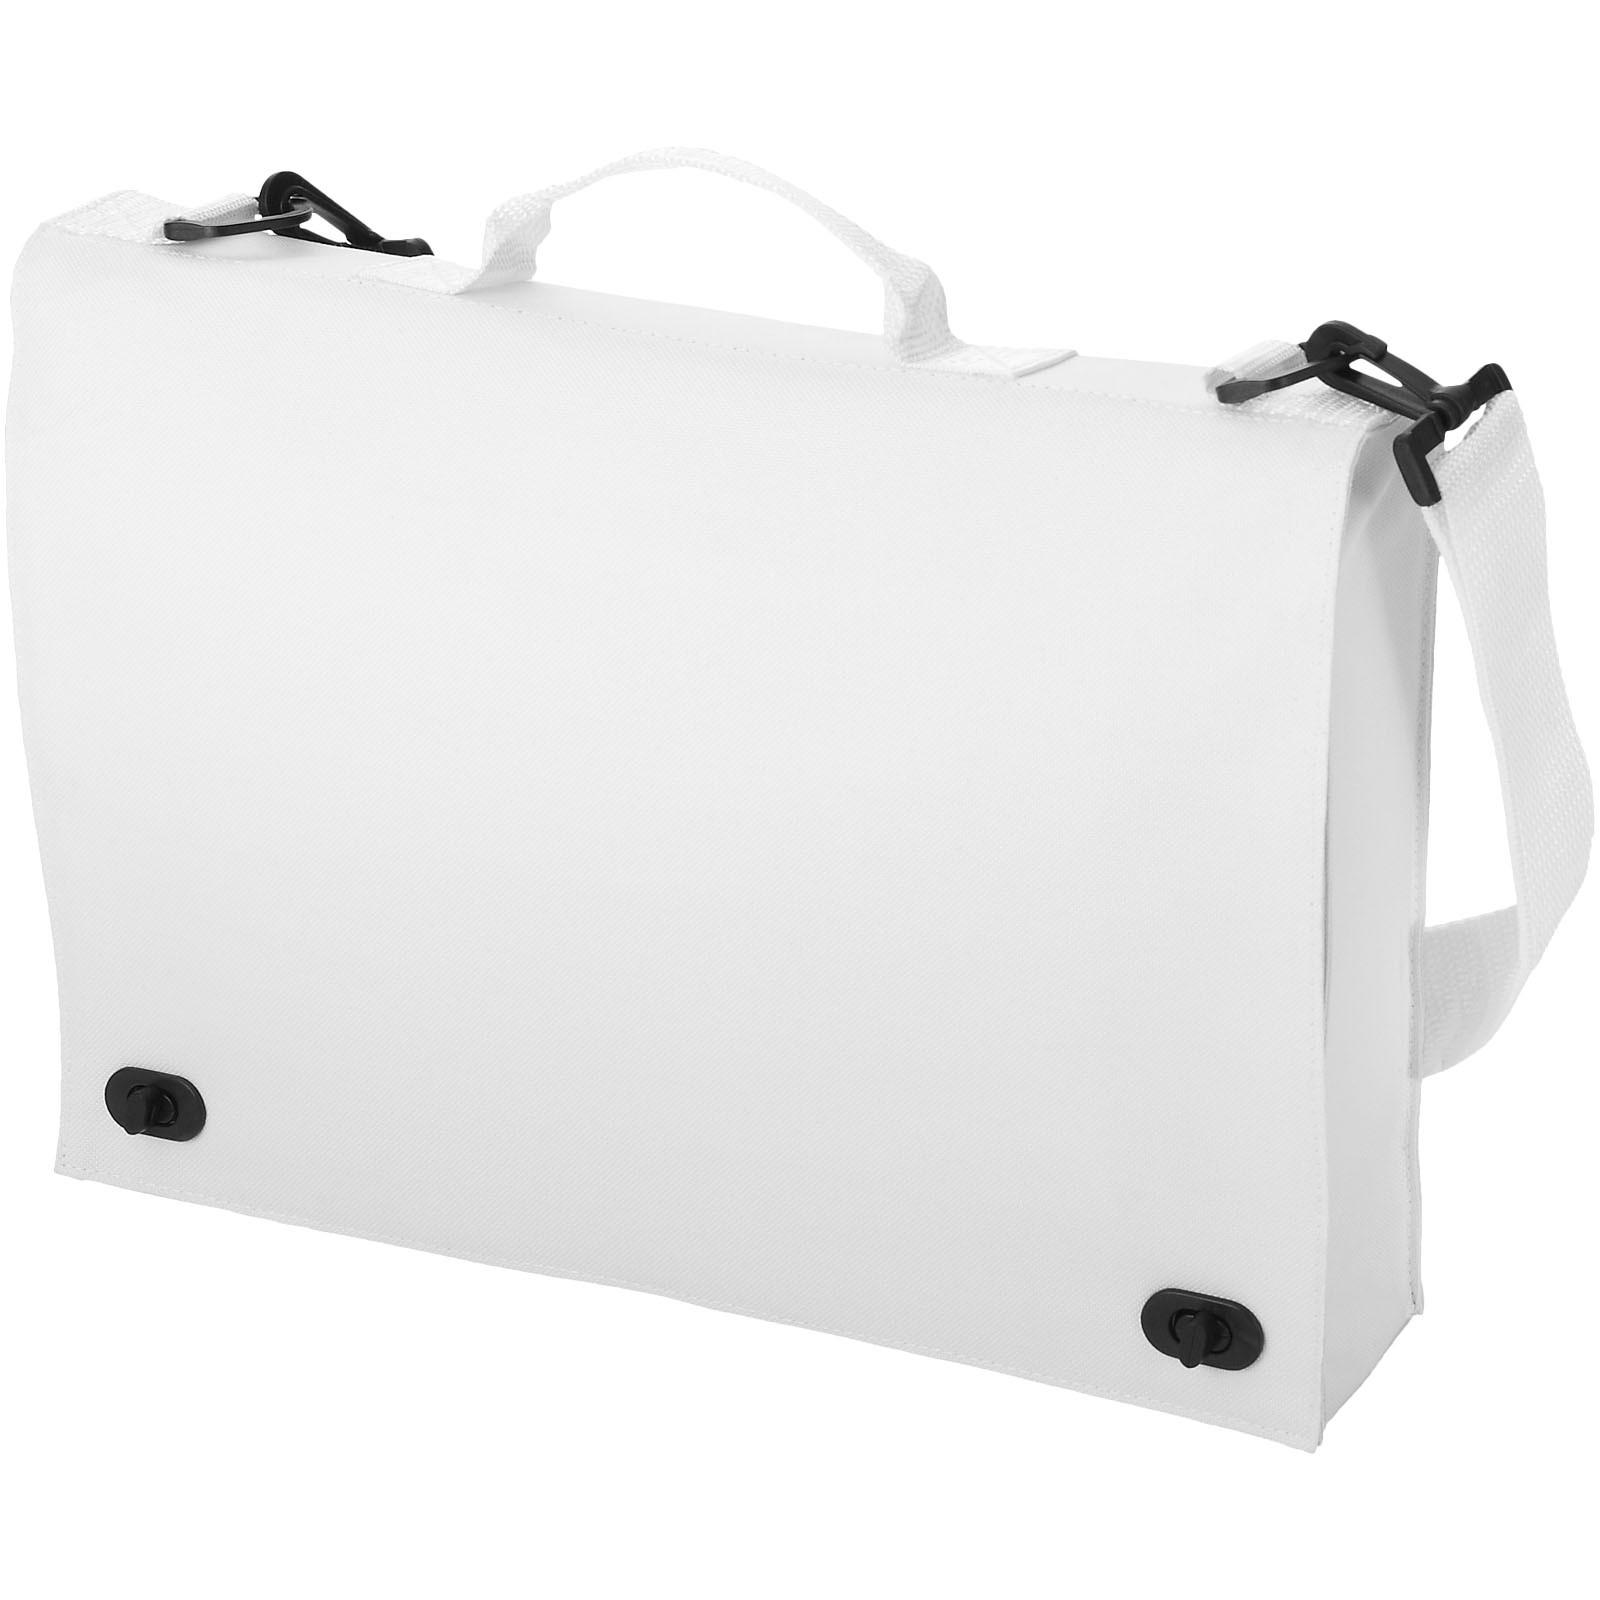 Santa Fe 2-buckle closure conference bag - White